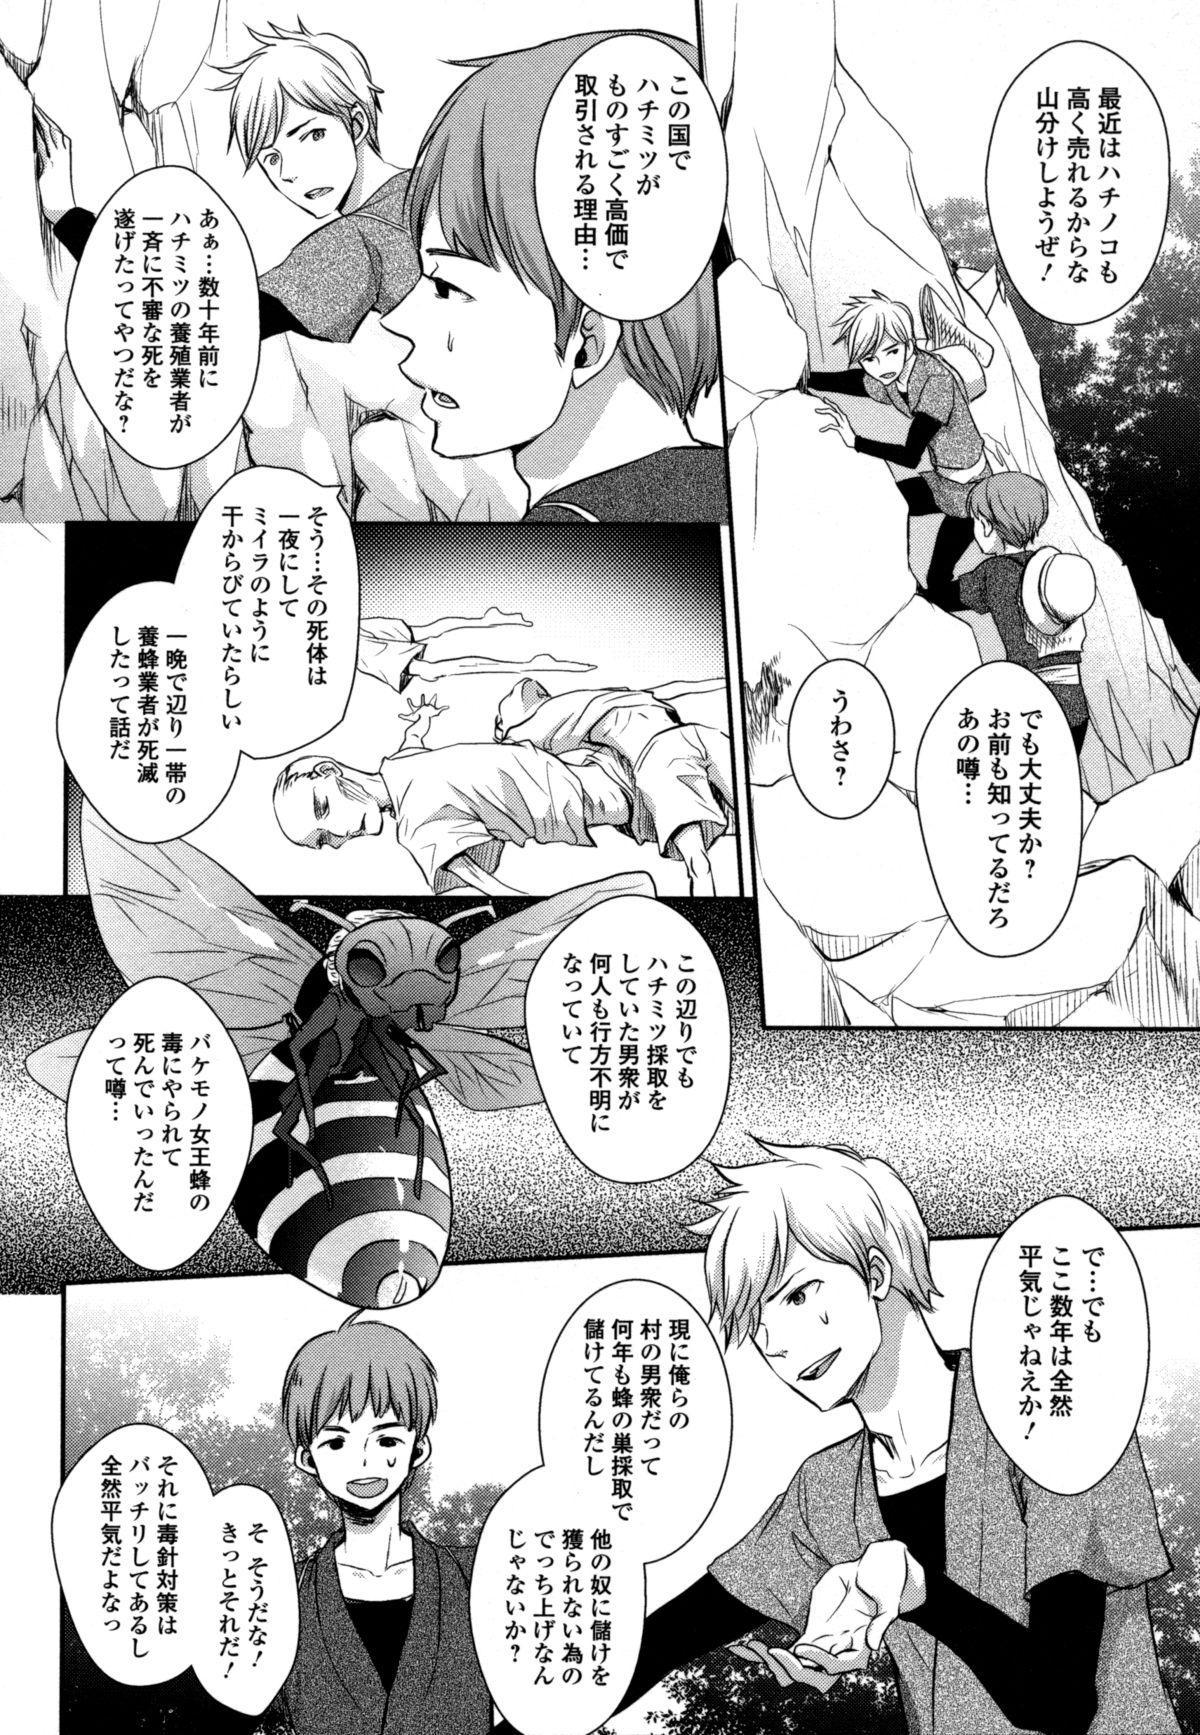 Monster Musume to no Kougou 85